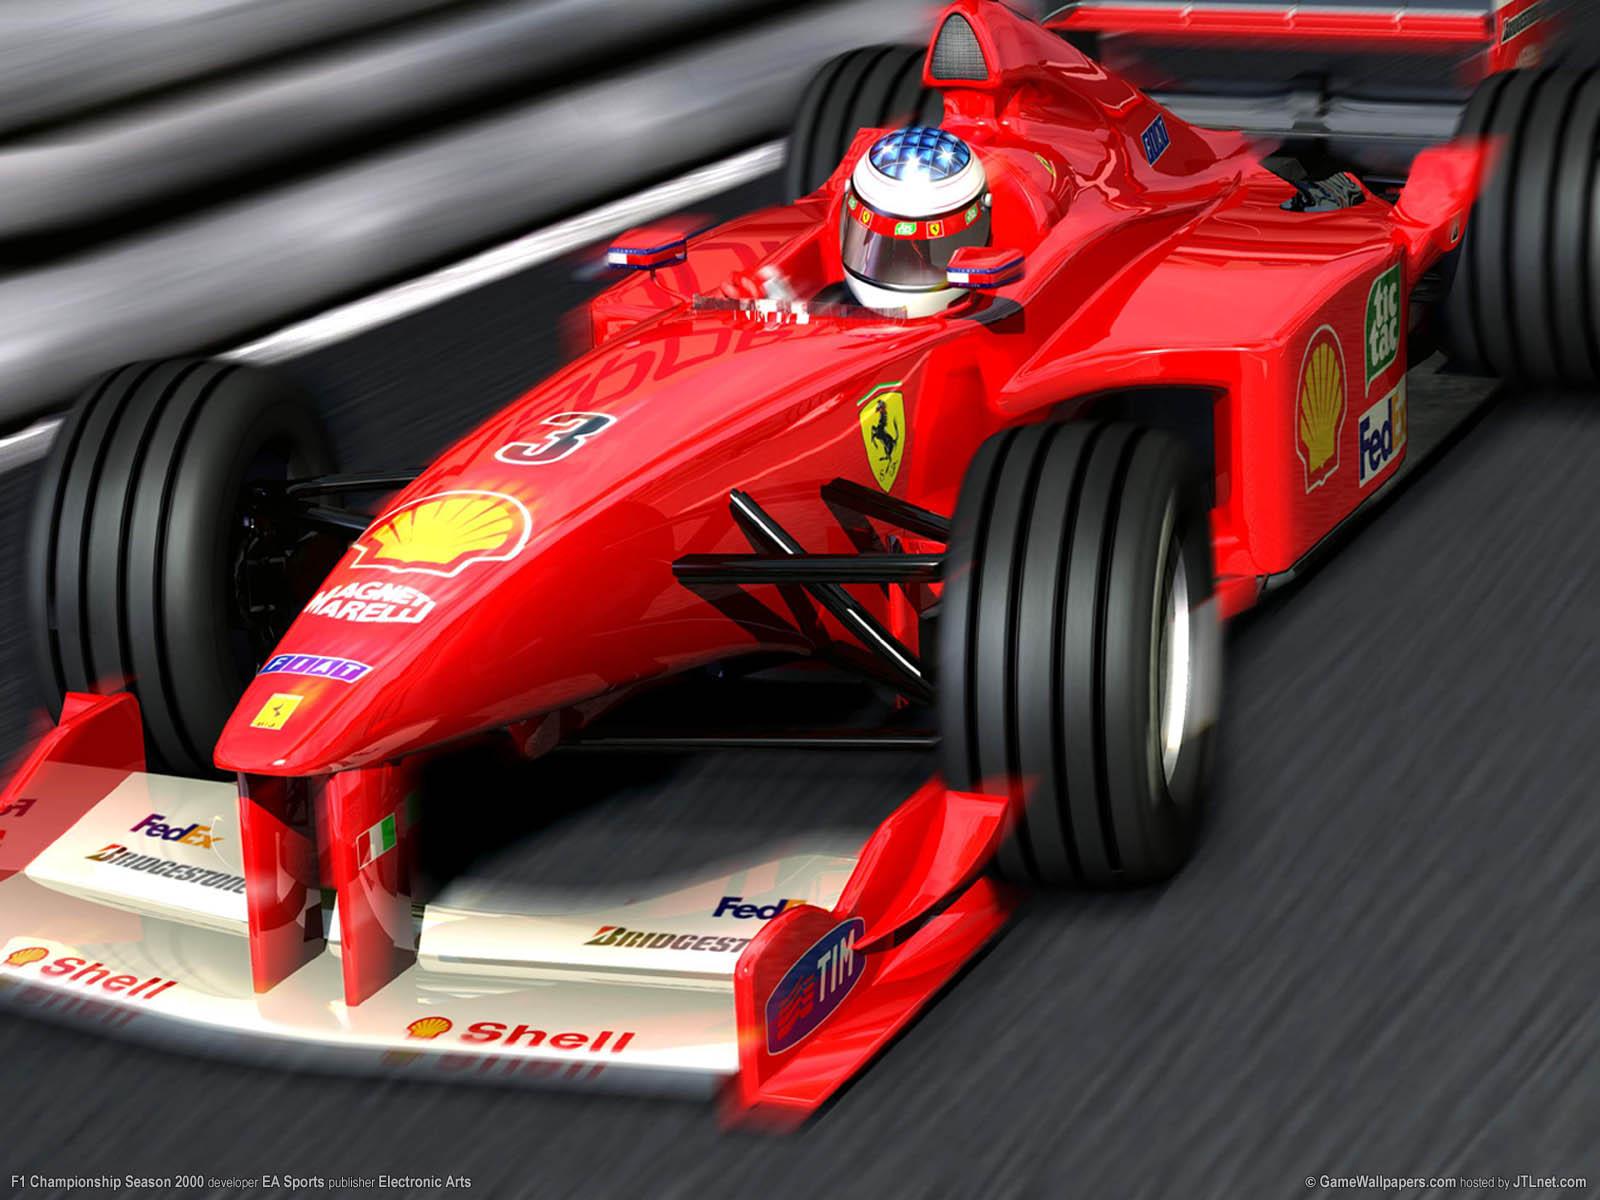 F1 Championship Season 2000 fond d'écran 04 1600x1200